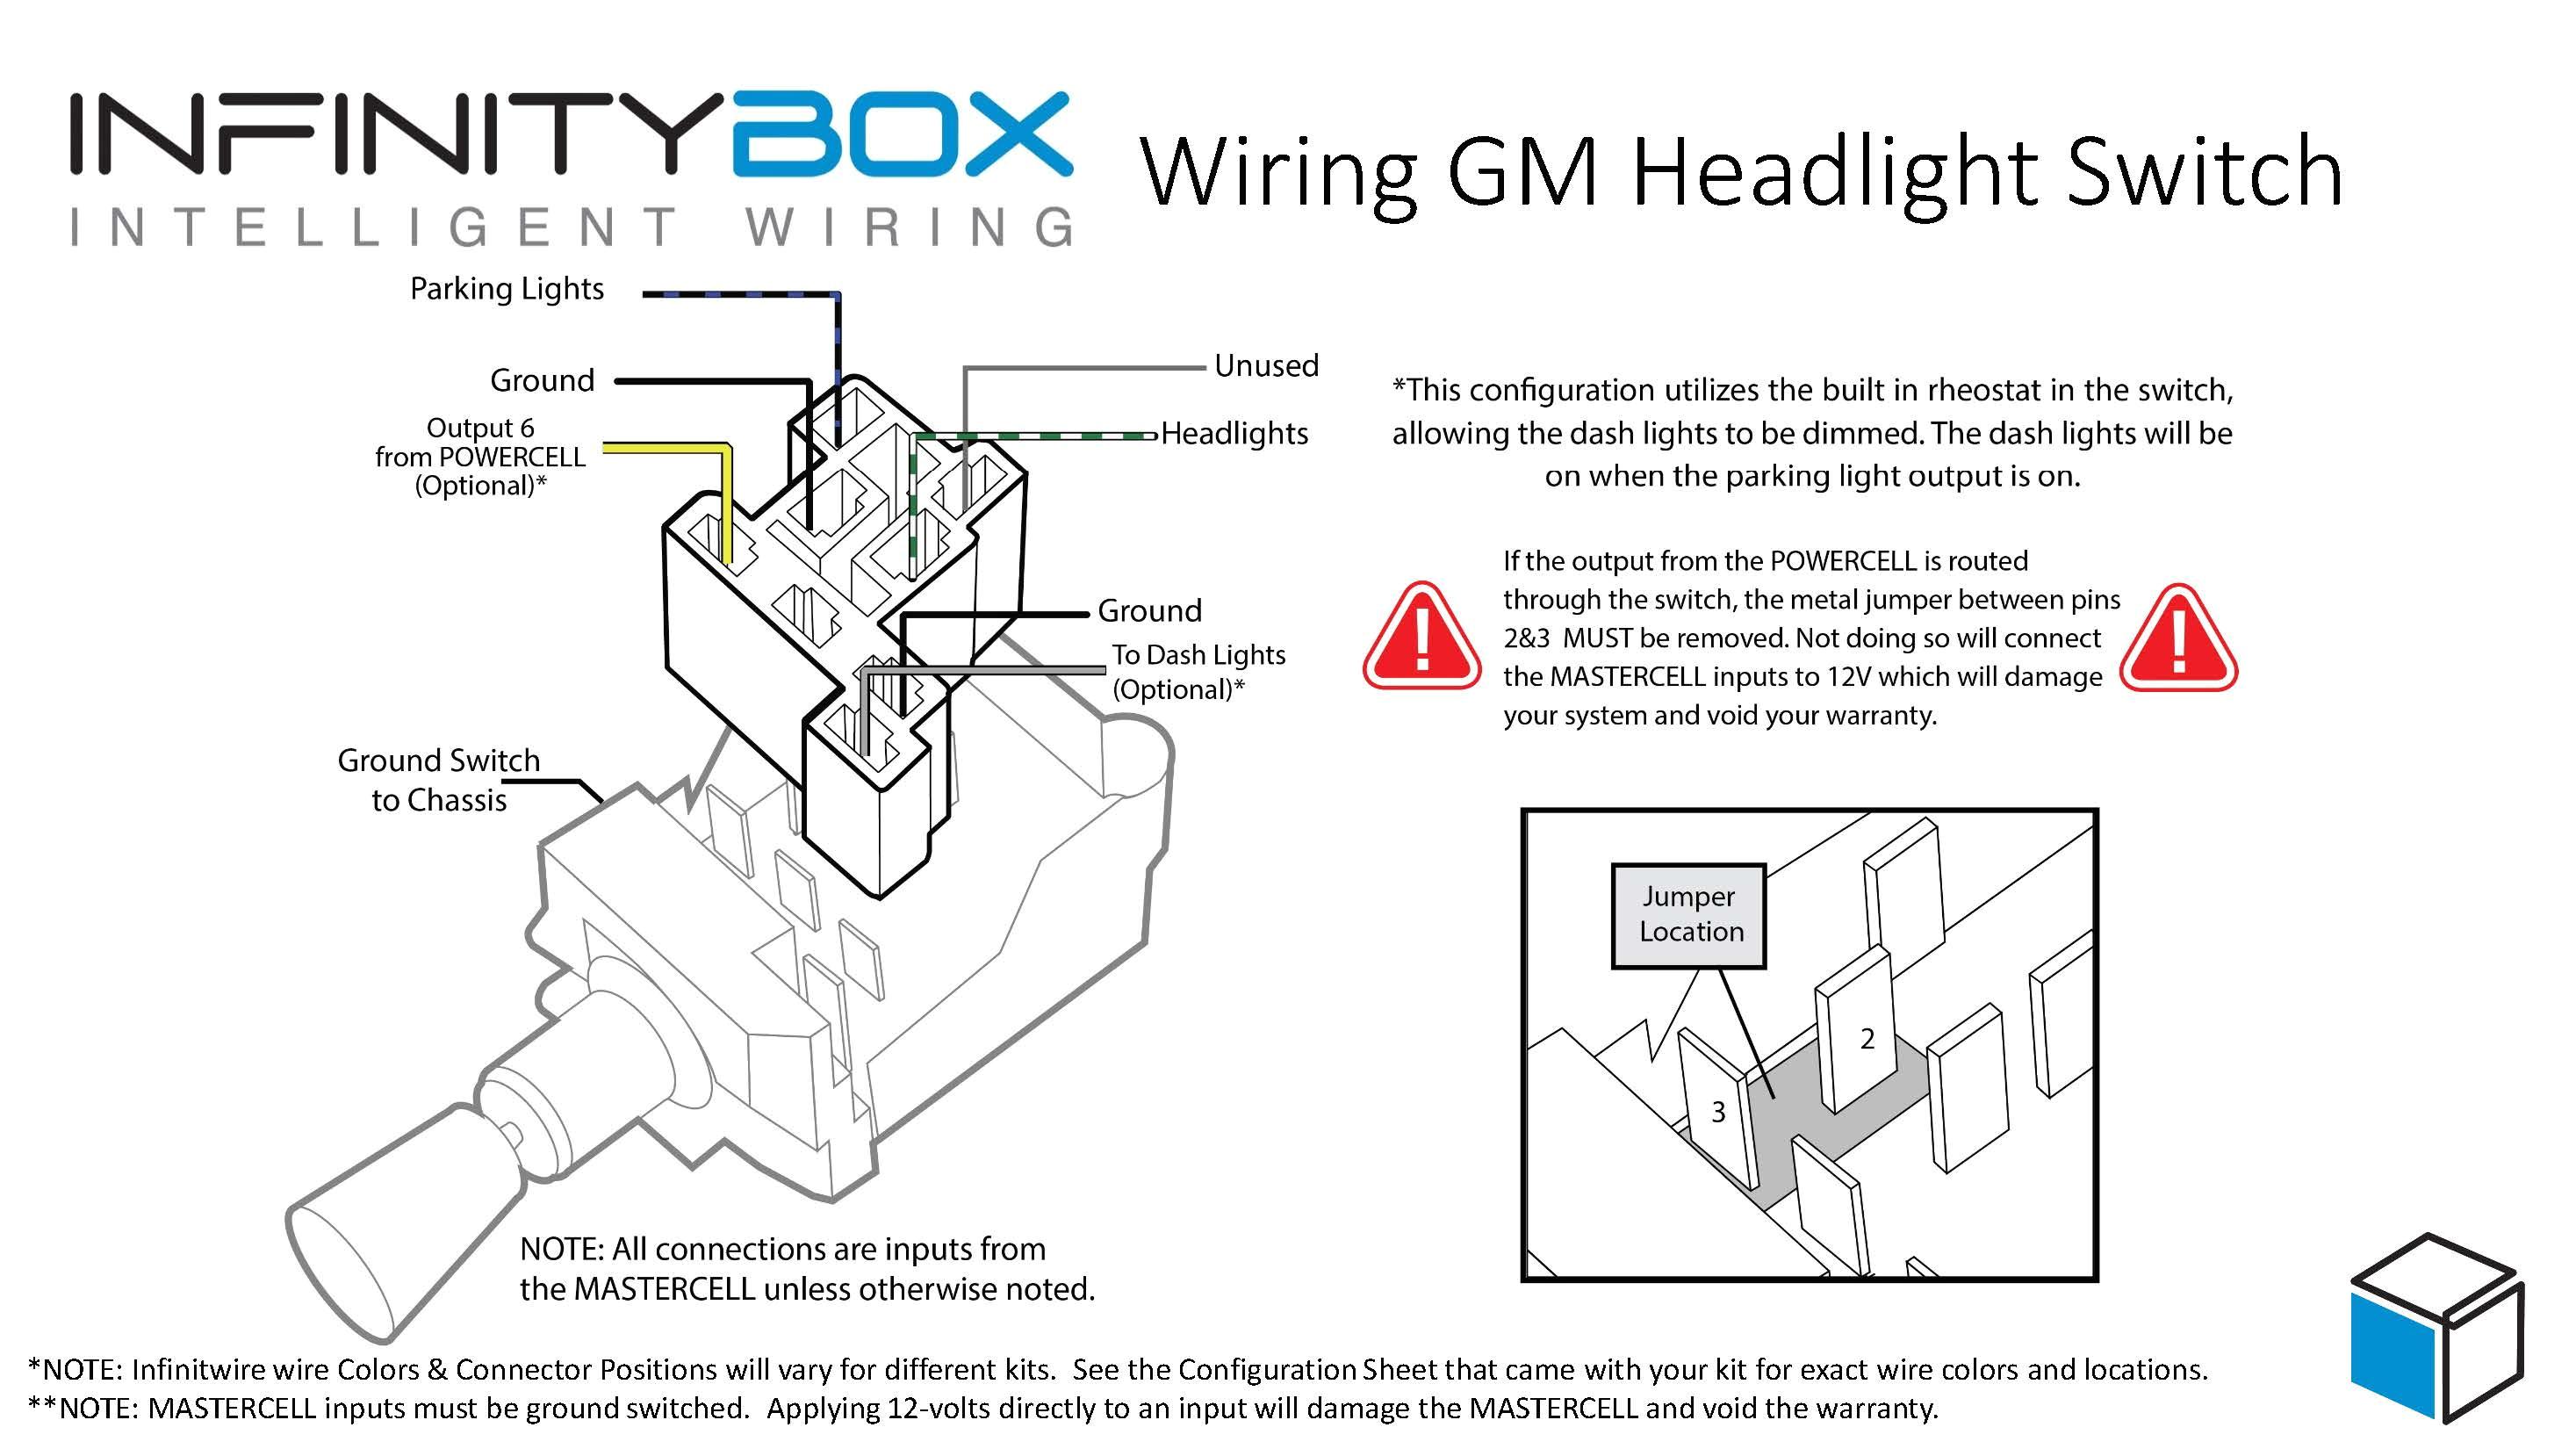 acdelco headlight switch wiring wiring diagram megaacdelco headlight switch wiring data wiring diagram acdelco headlight switch